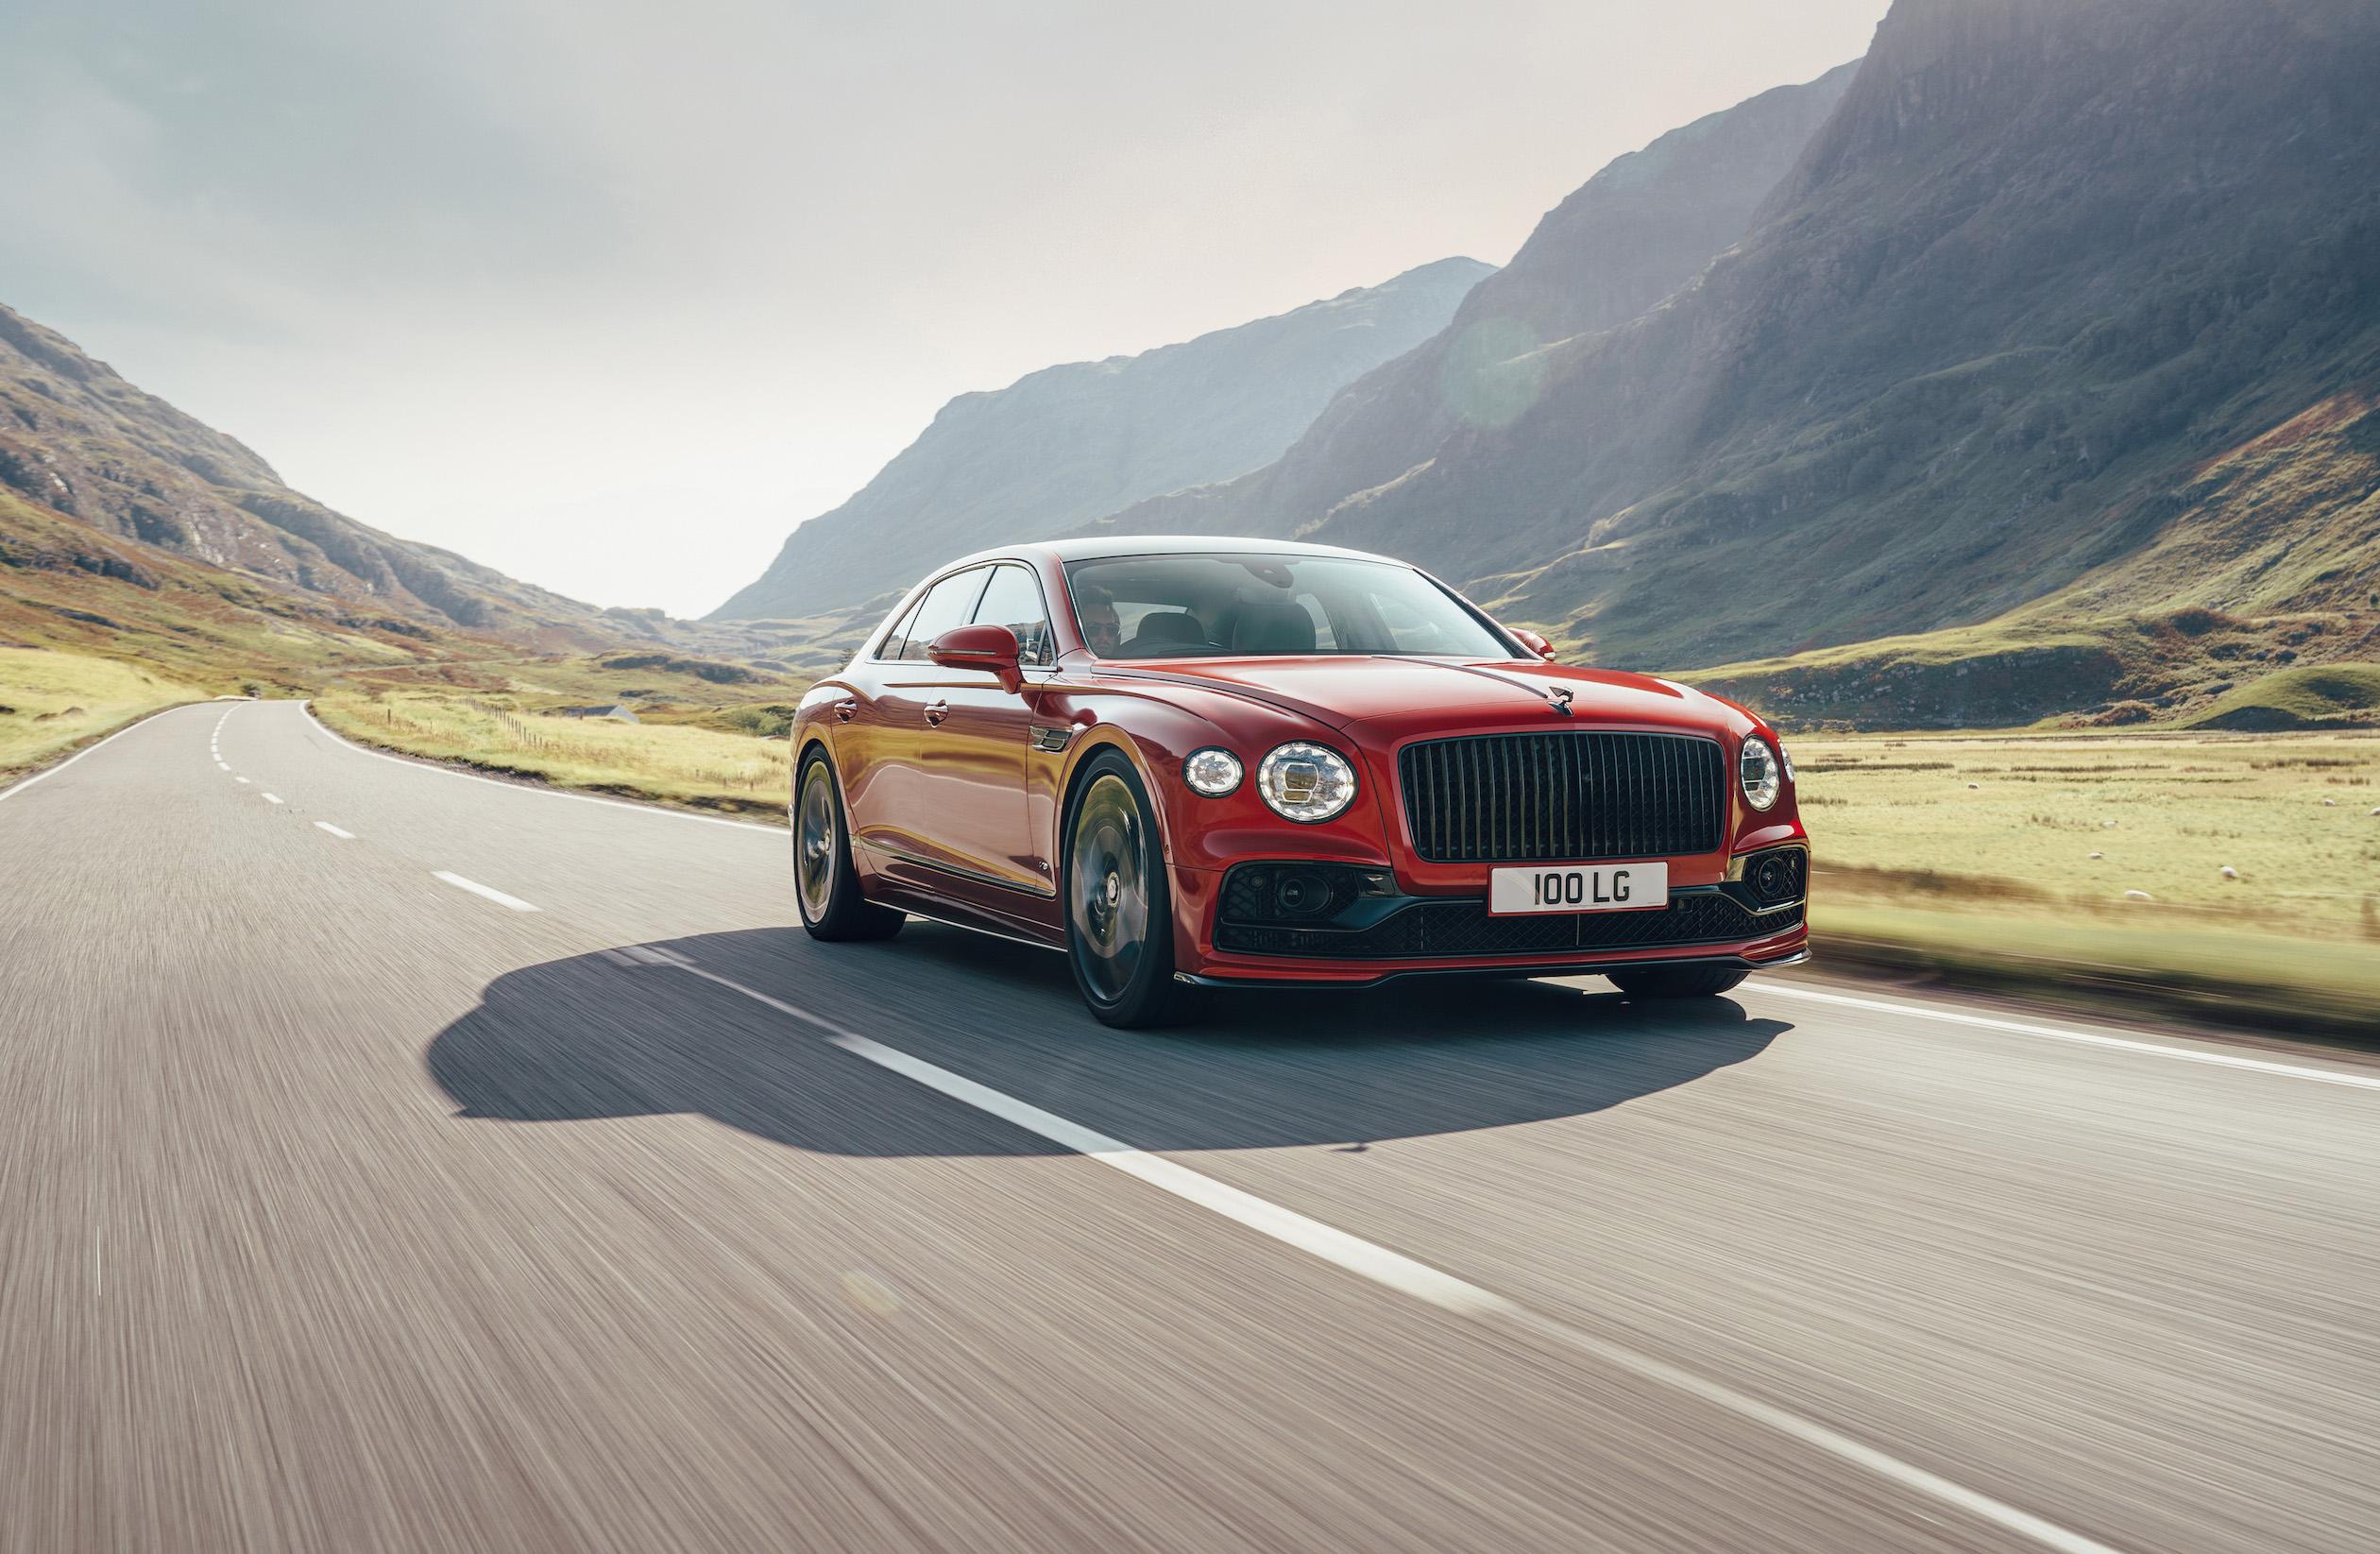 Bentley Flying Spur a primit propulsorul V8 cu 550 CP